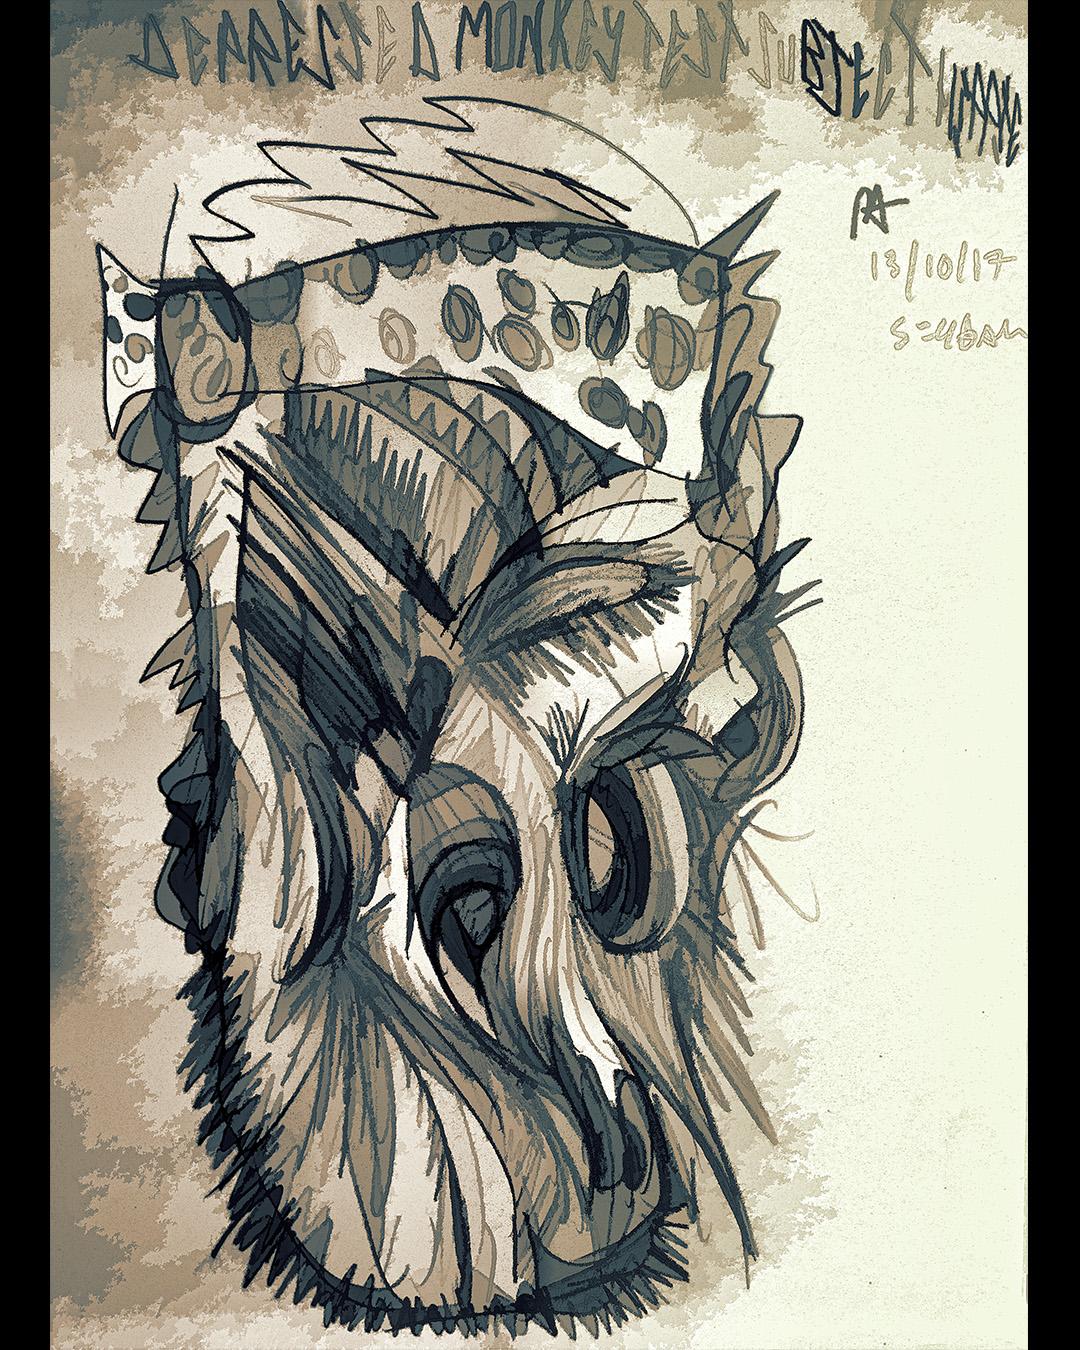 DEPRESSED MONKEY TEST SUBJECT HIPPIE